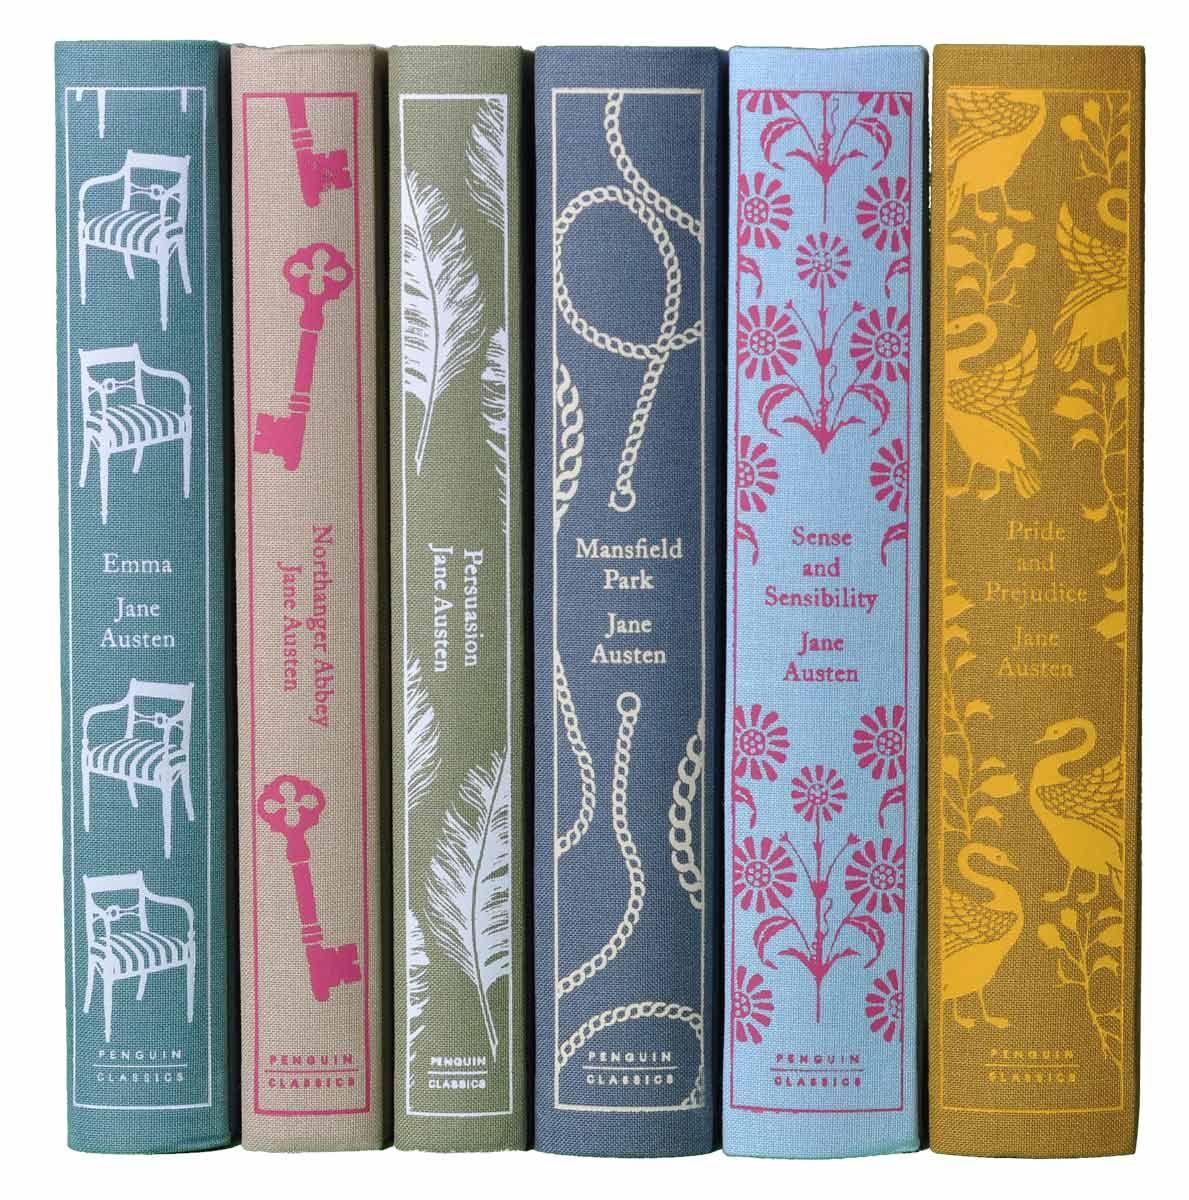 Decorative Jane Austen Books From Penguin Juniper Books Jane Austen Books Jane Austen Book Worms